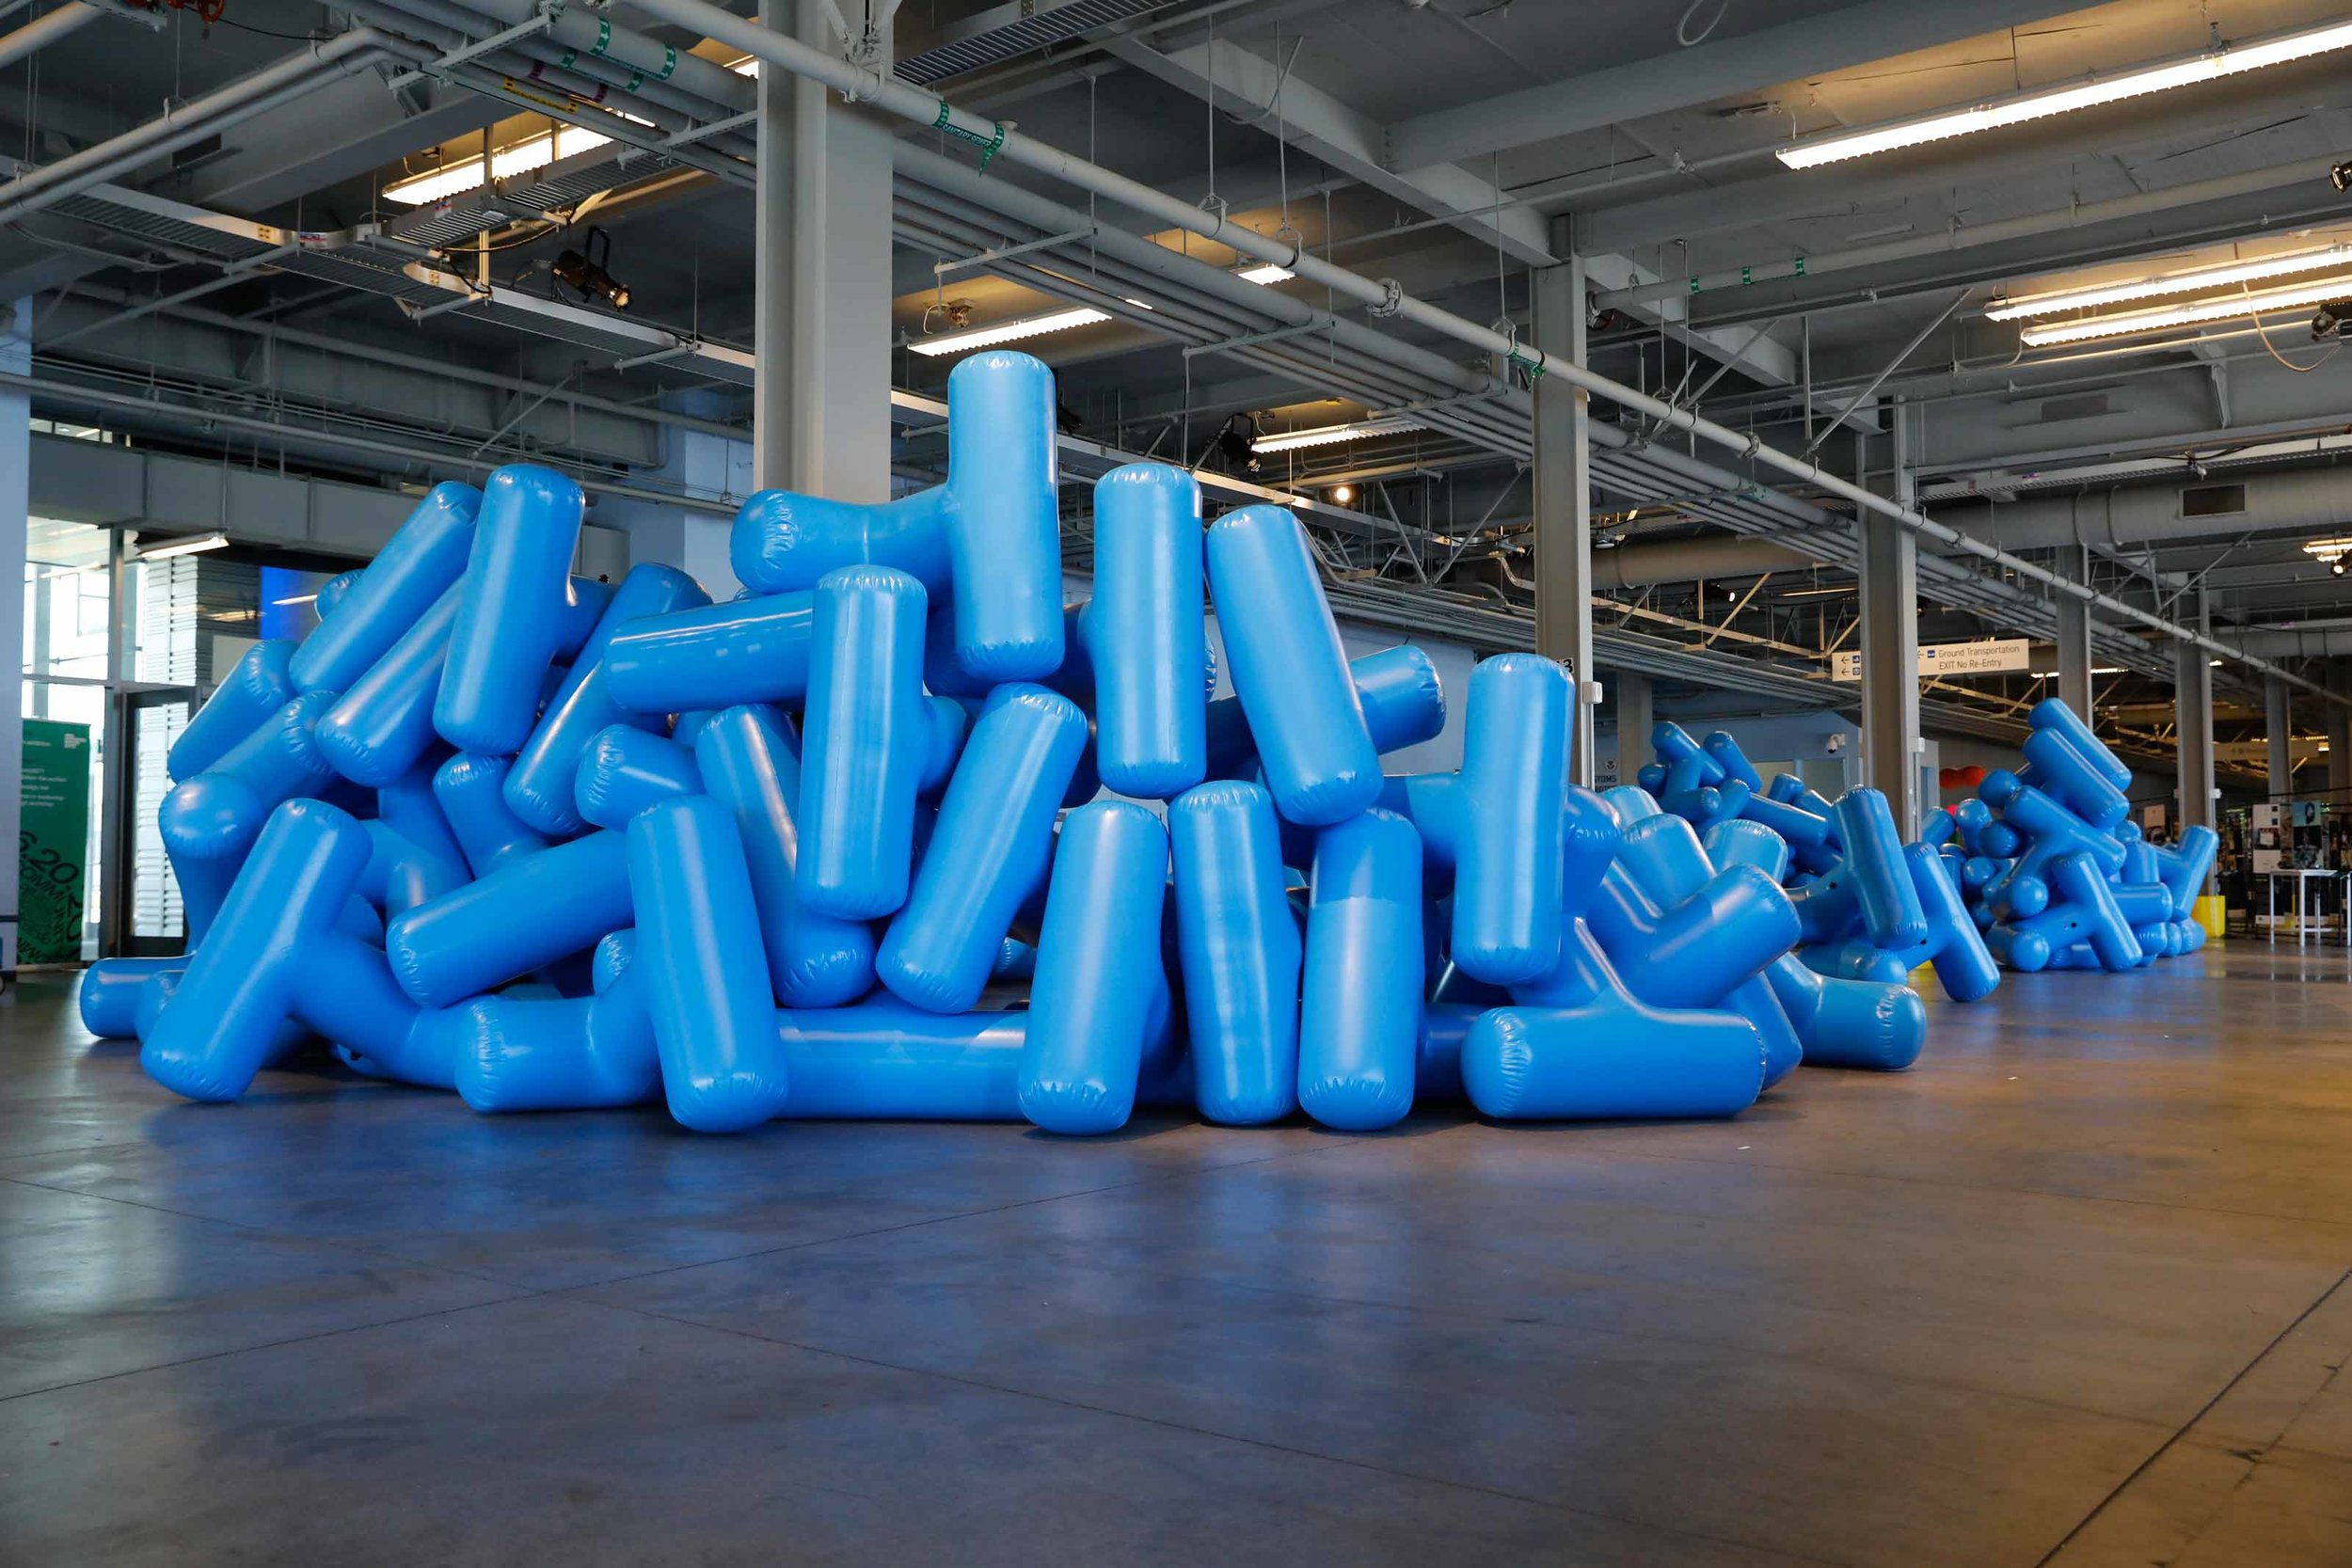 adrien-rovero-studio-sf-design-week-shore-installation-pch-1.jpg